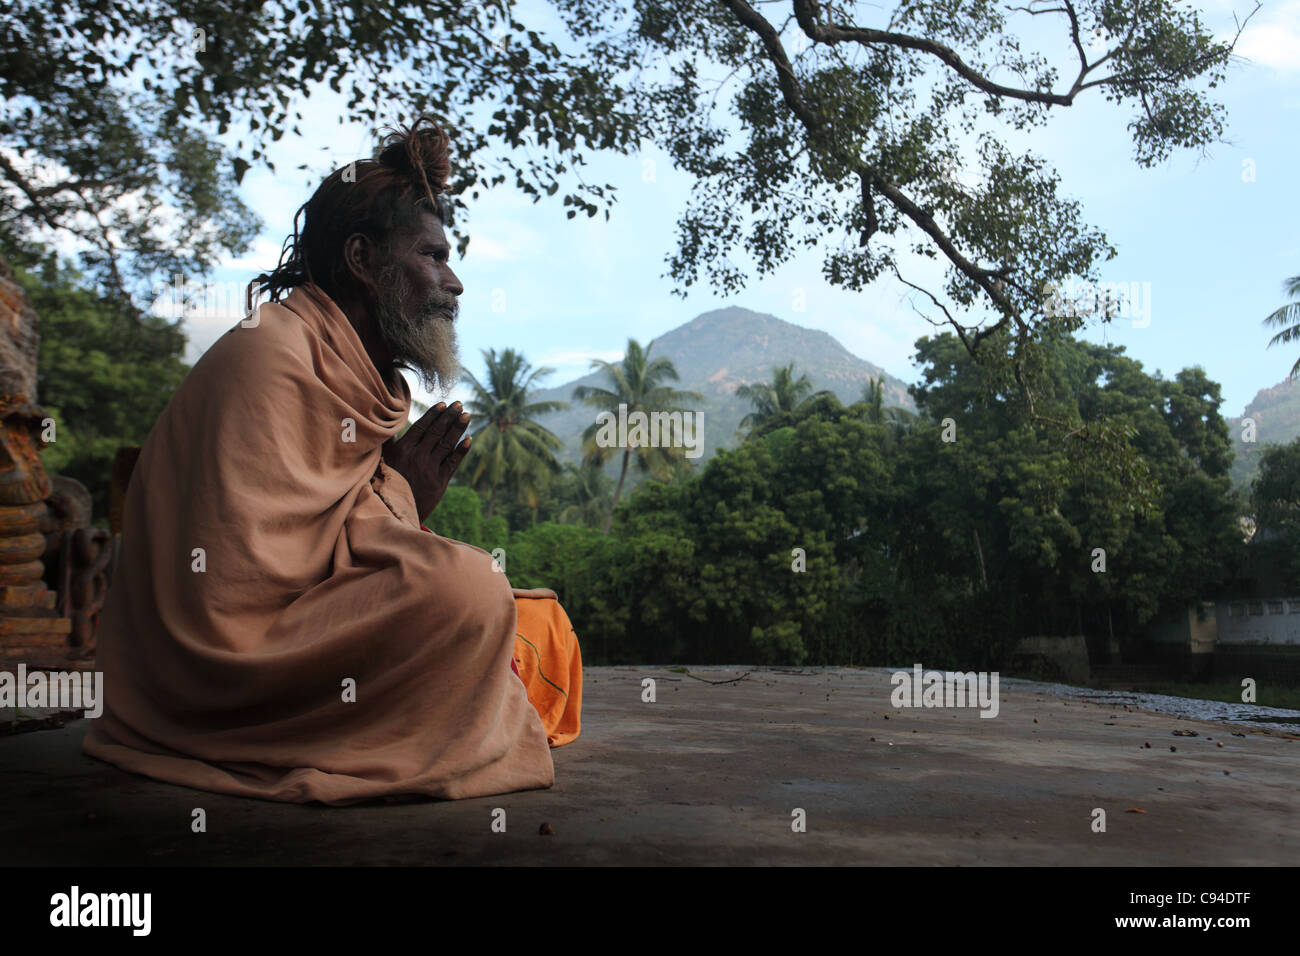 Sadhu sitting at a holy tree with statues of Hindu gods Tamil Nadu India - Stock Image